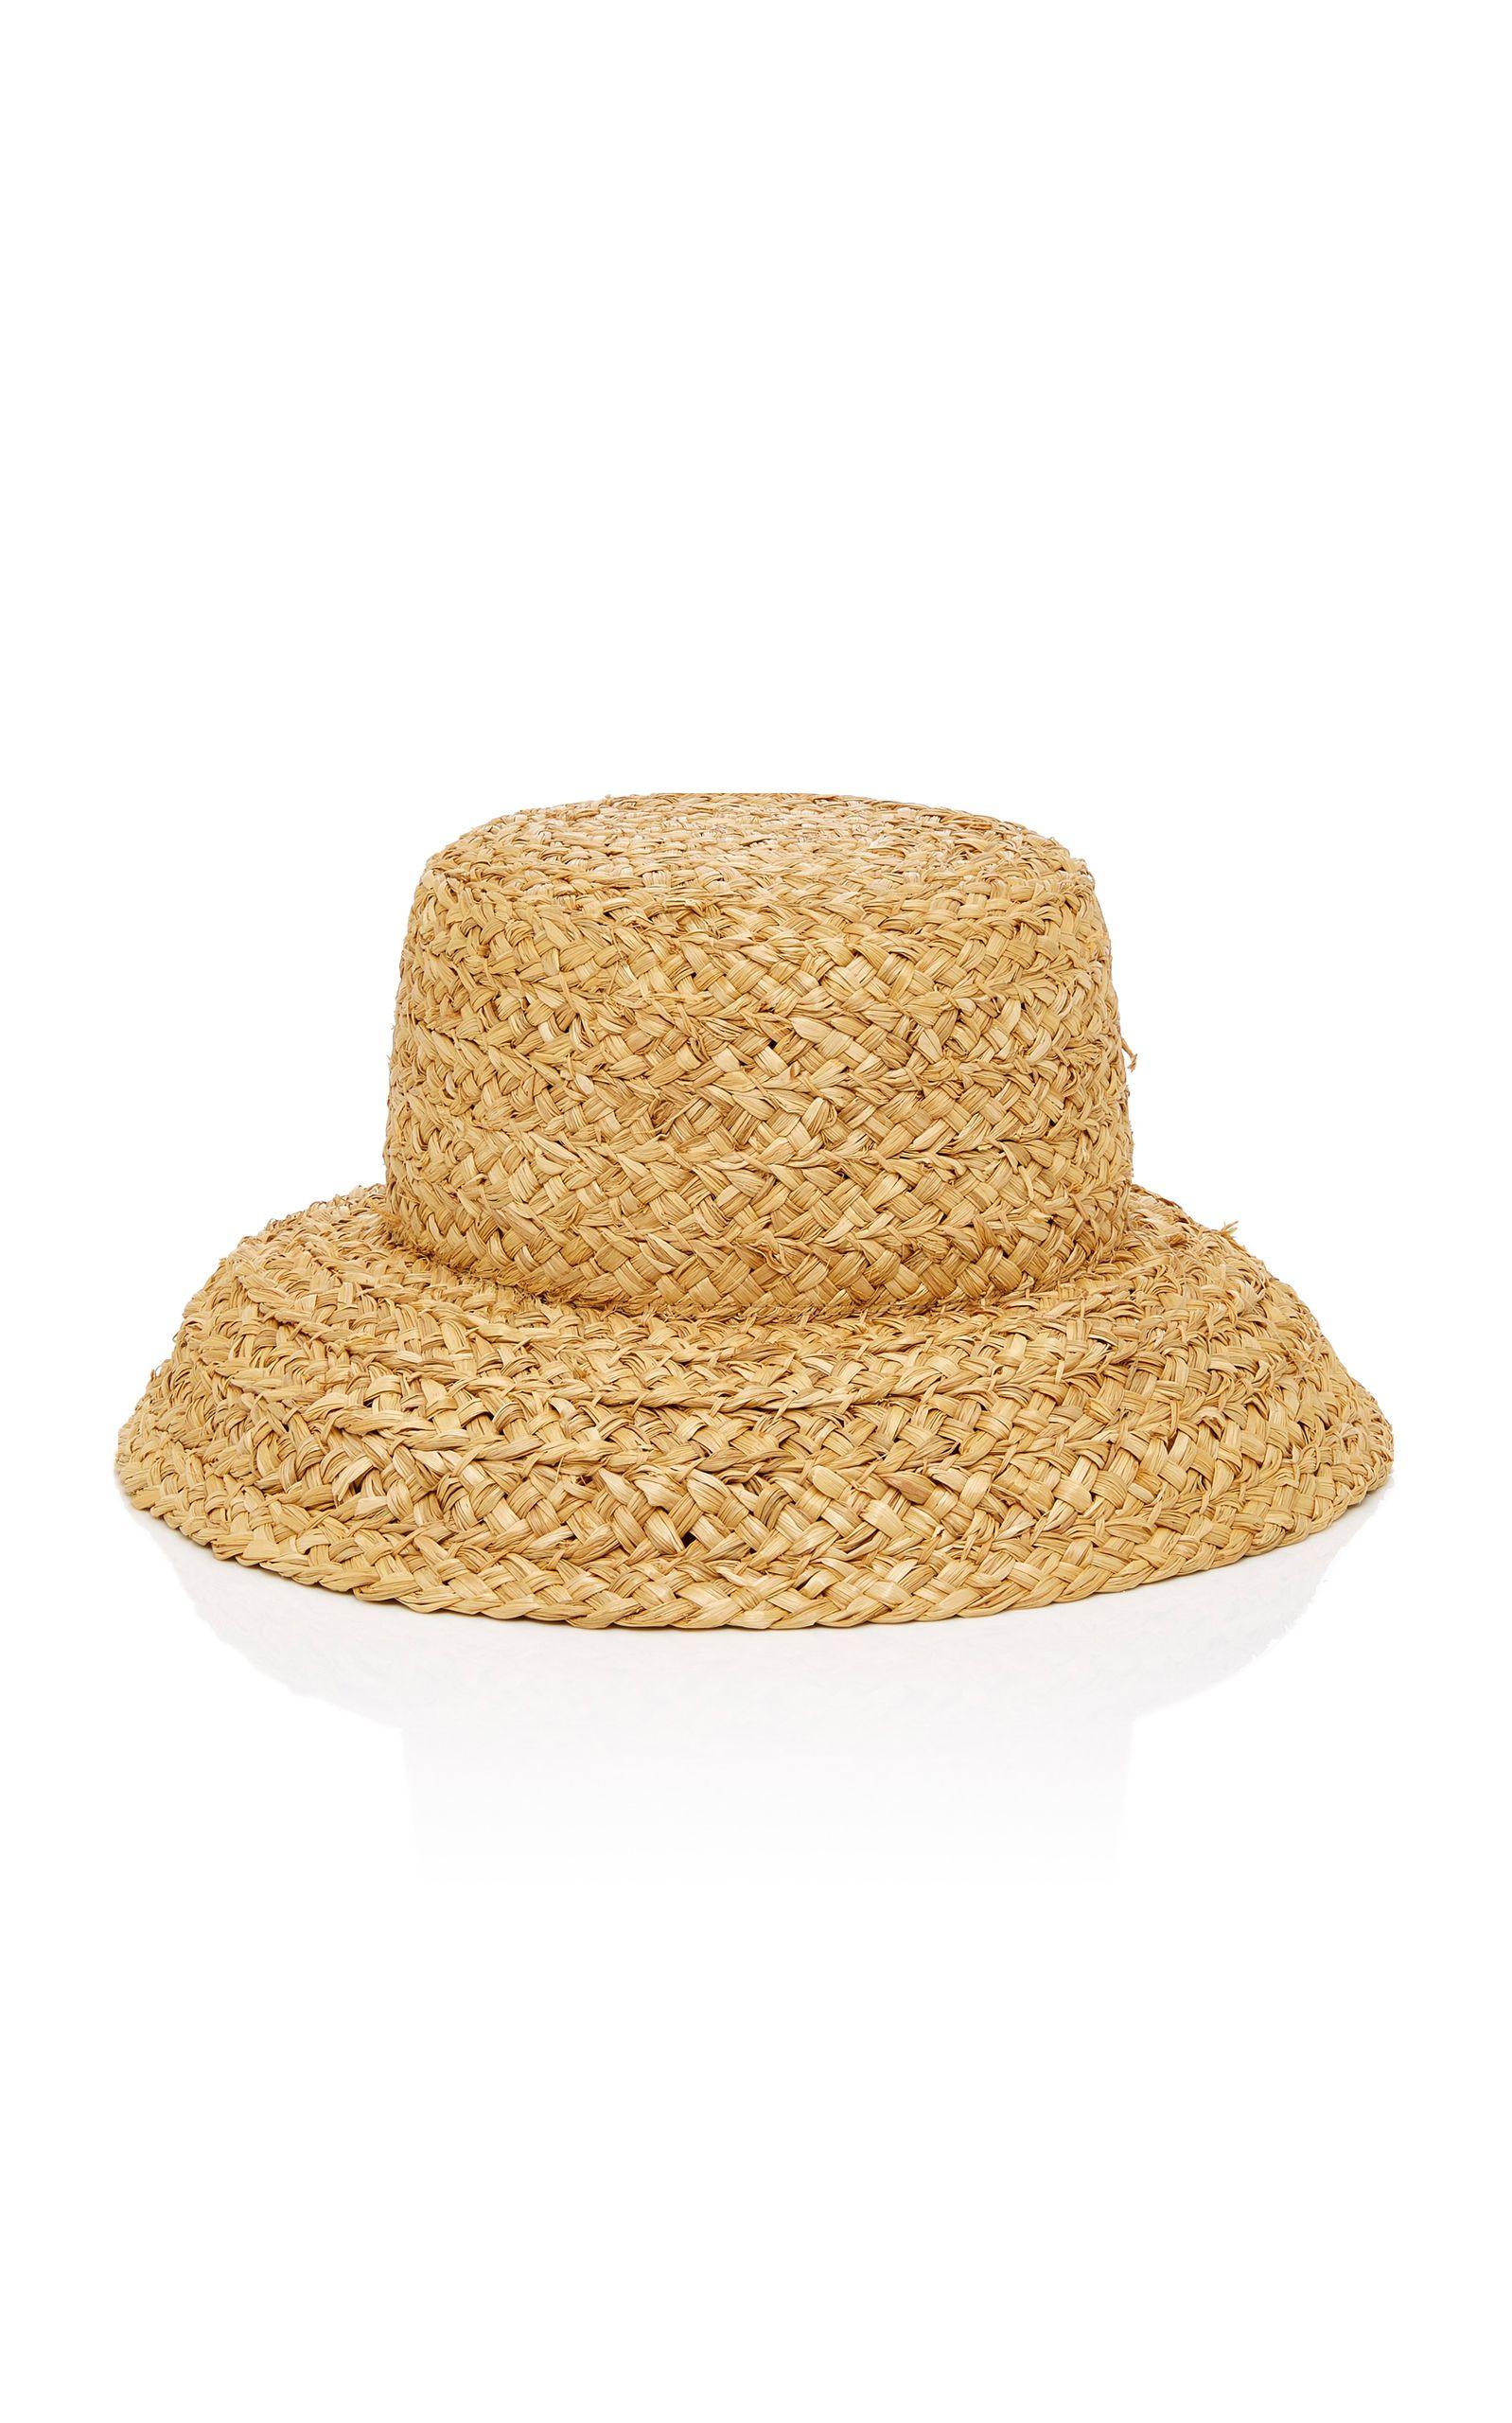 d55392d290b Sydney Woven Straw Bucket Hat in 2019 Maine t Maine